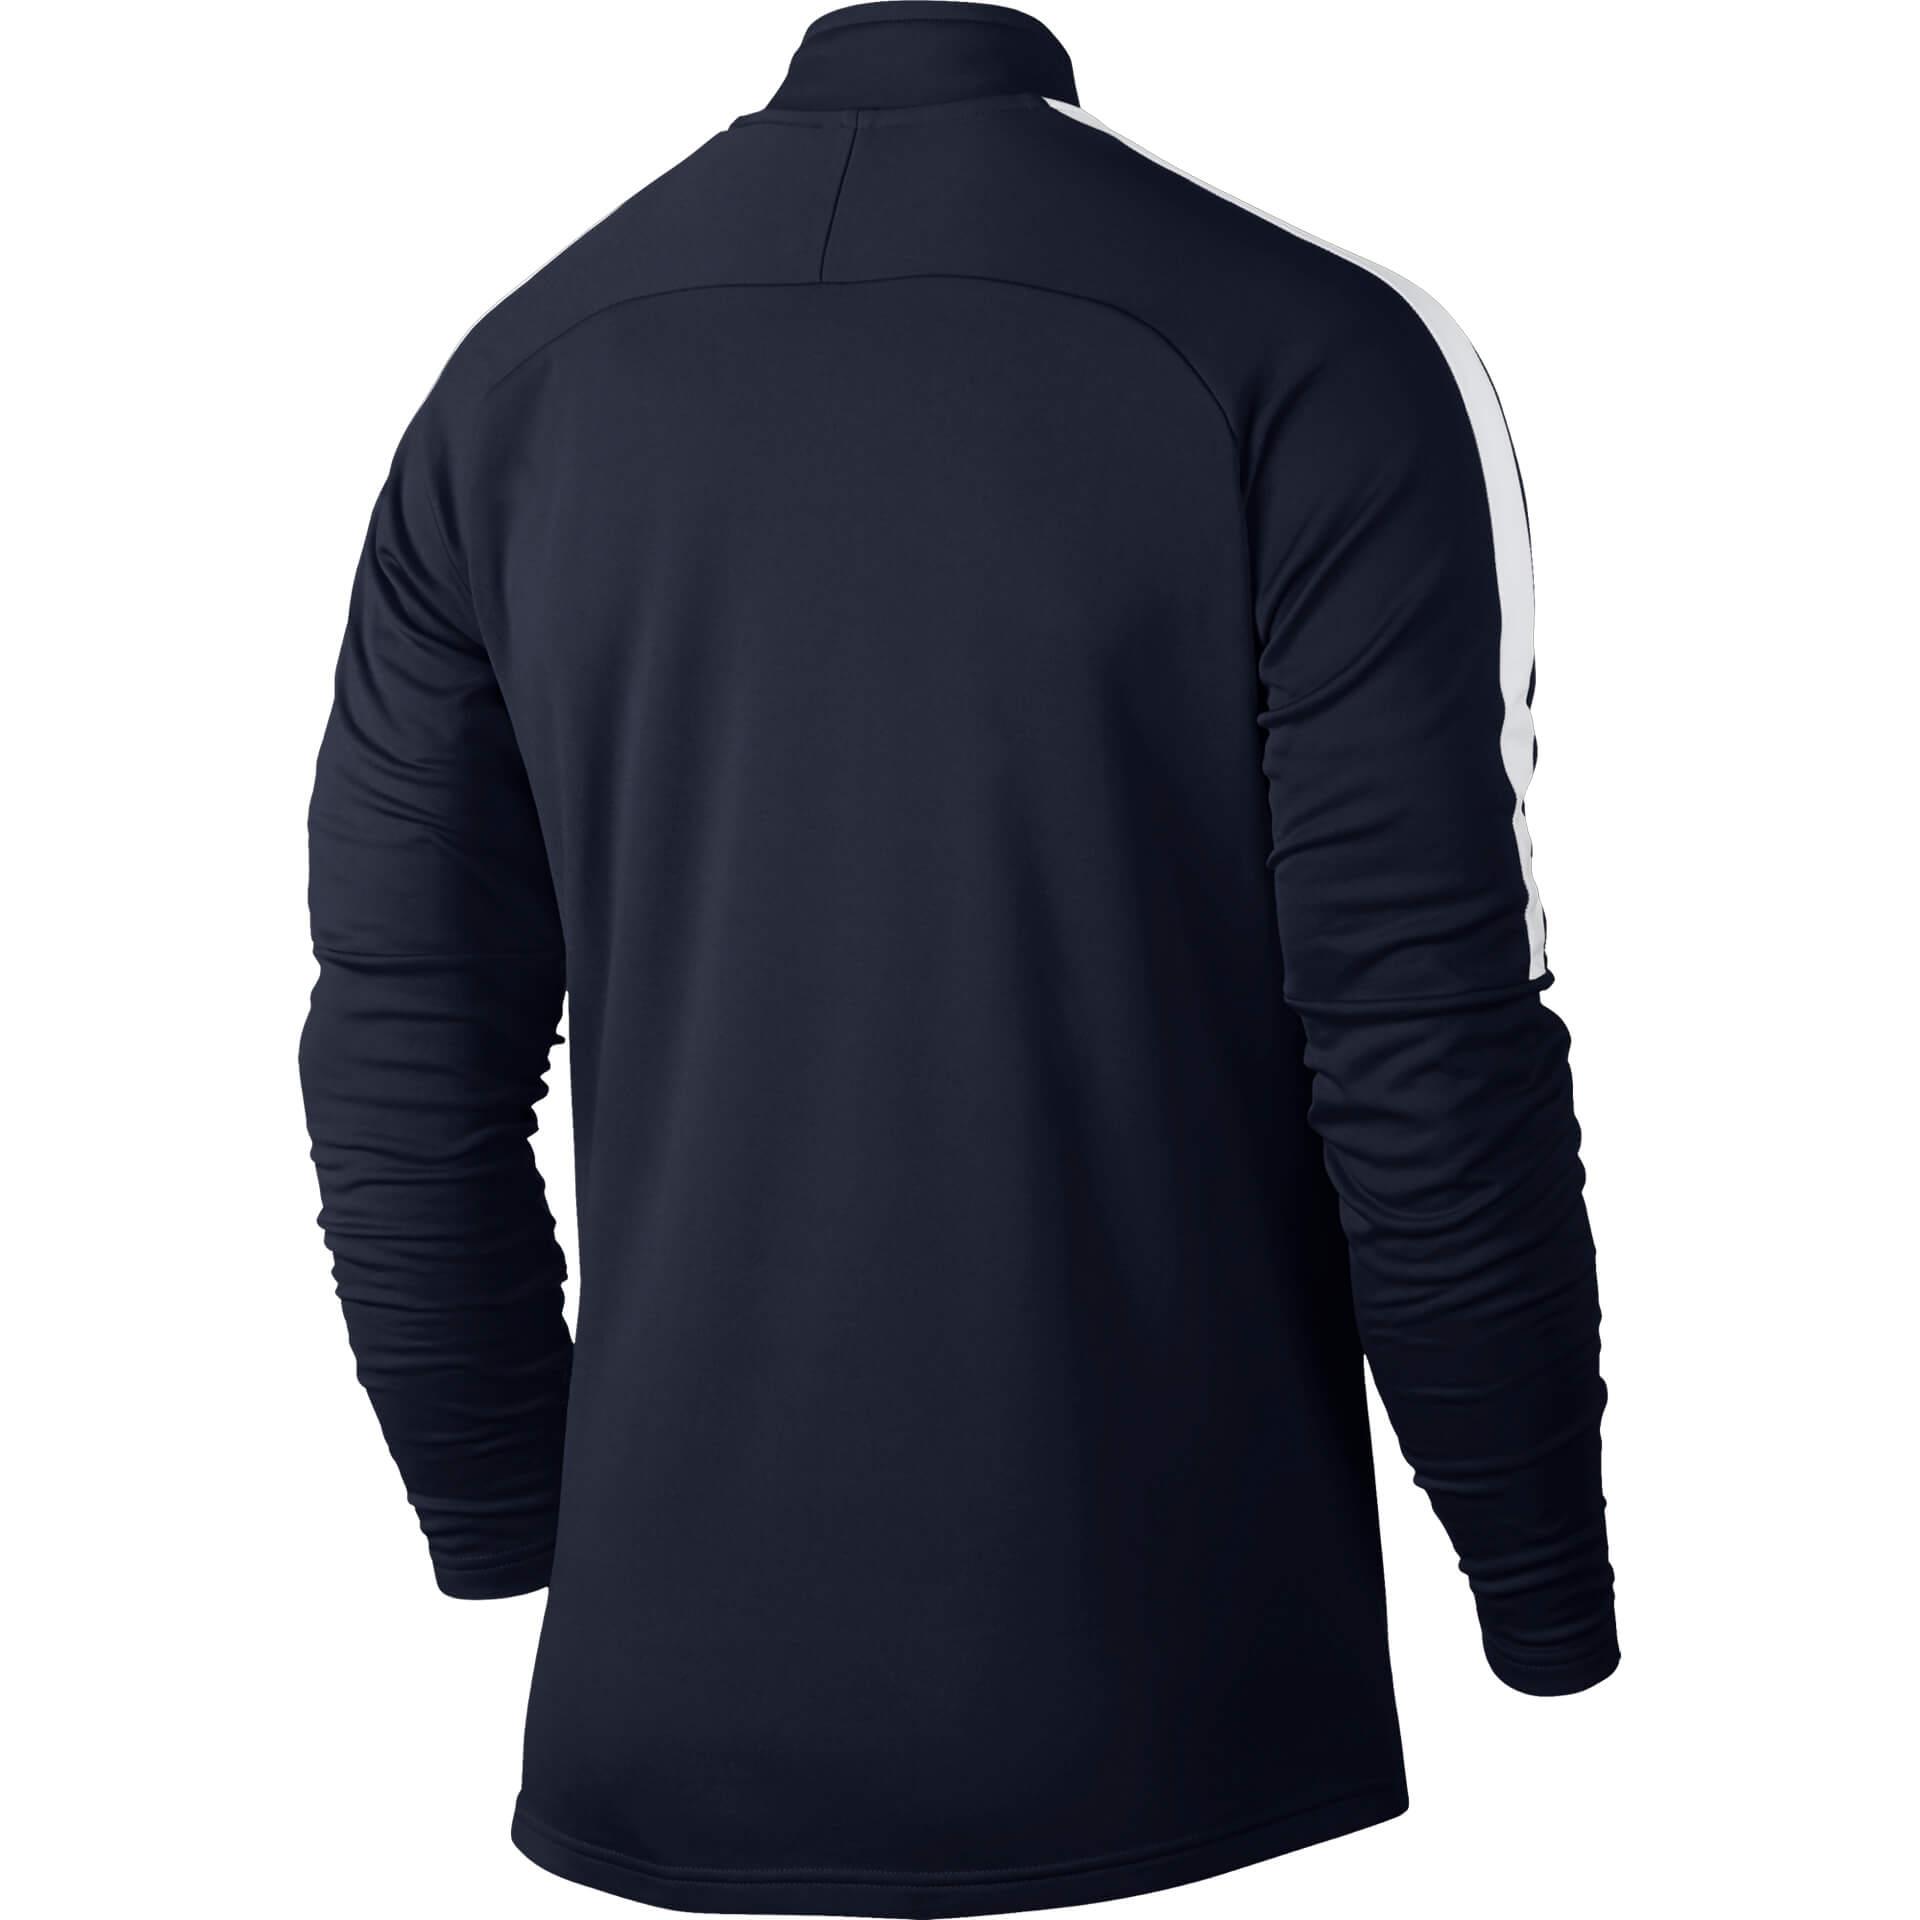 d68dc4672f Nike-Men-s-Nike-Dry-Academy-Football-Drill-Top-2070644-01-132580.jpg